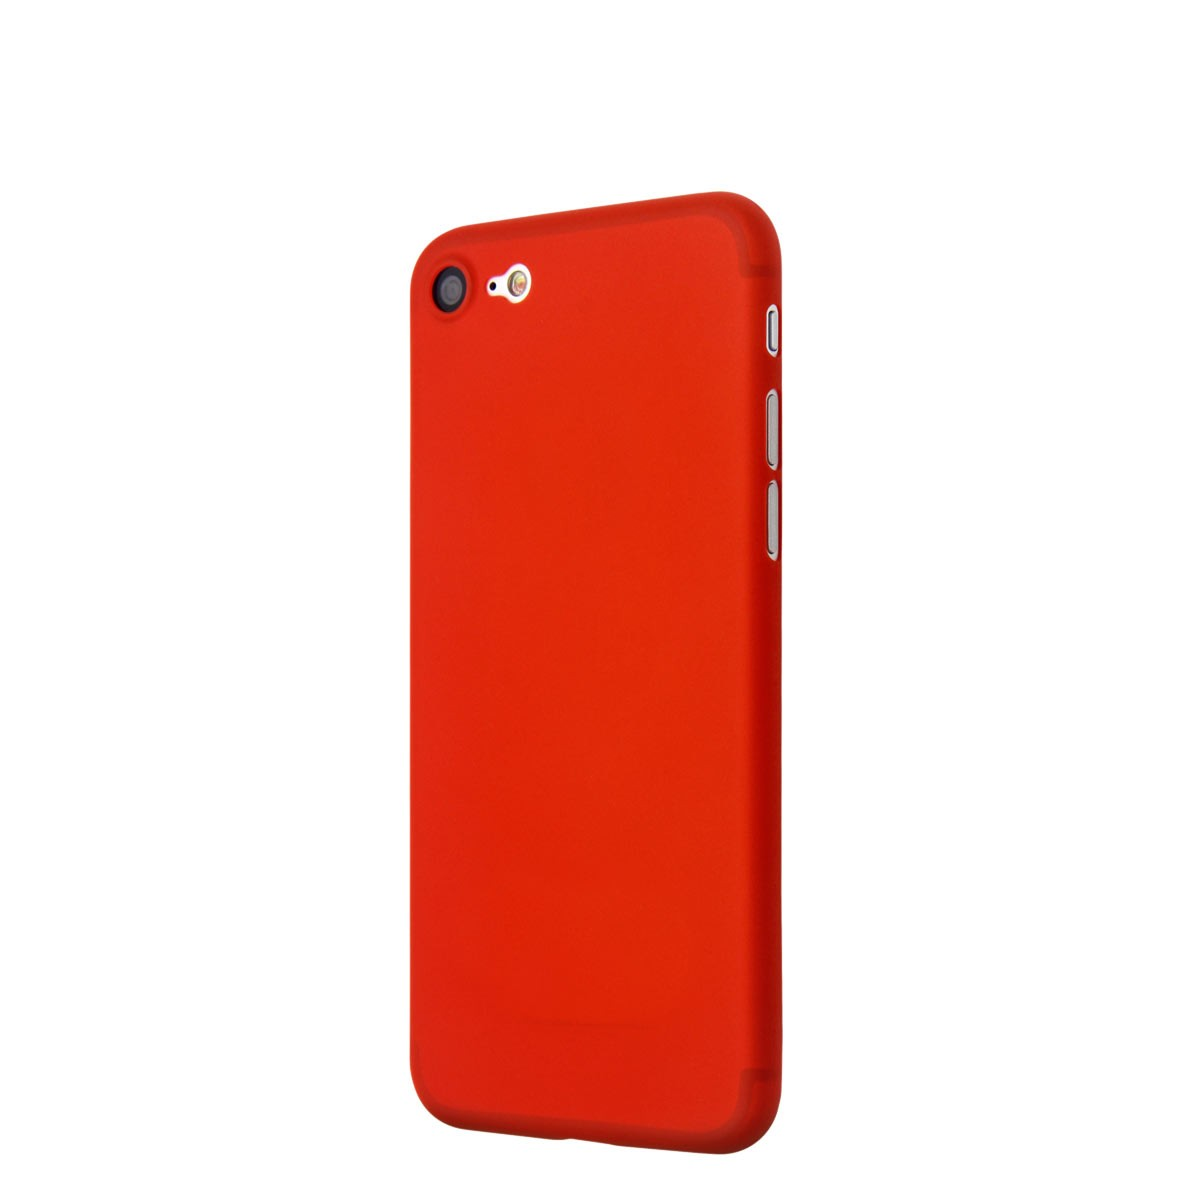 Capac protectie spate cellara colectia thin pentru iphone 7/8/se2 - rosu